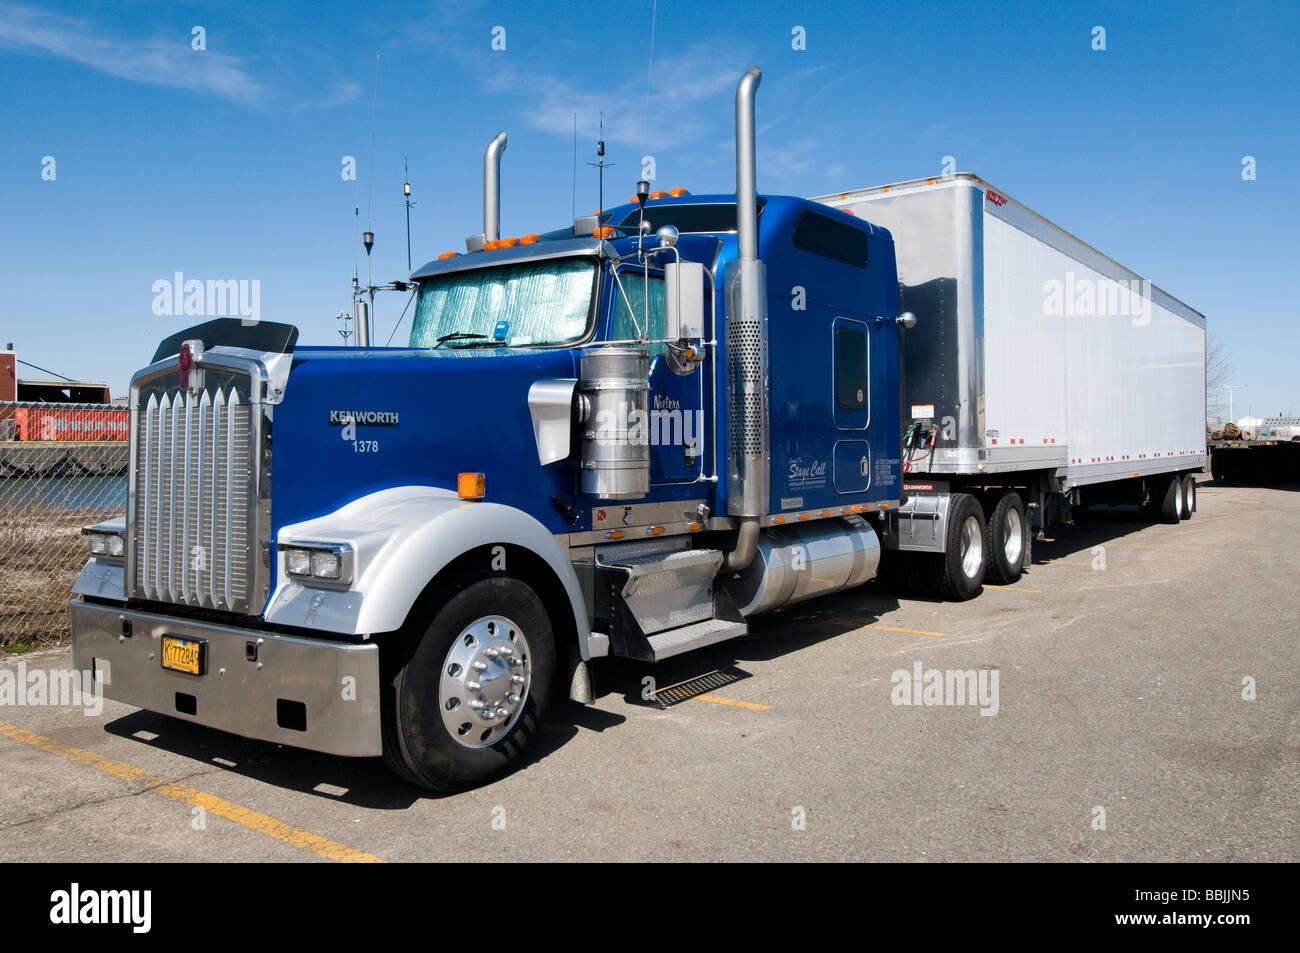 Kenworth truck at parking lot, Toronto - Stock Image